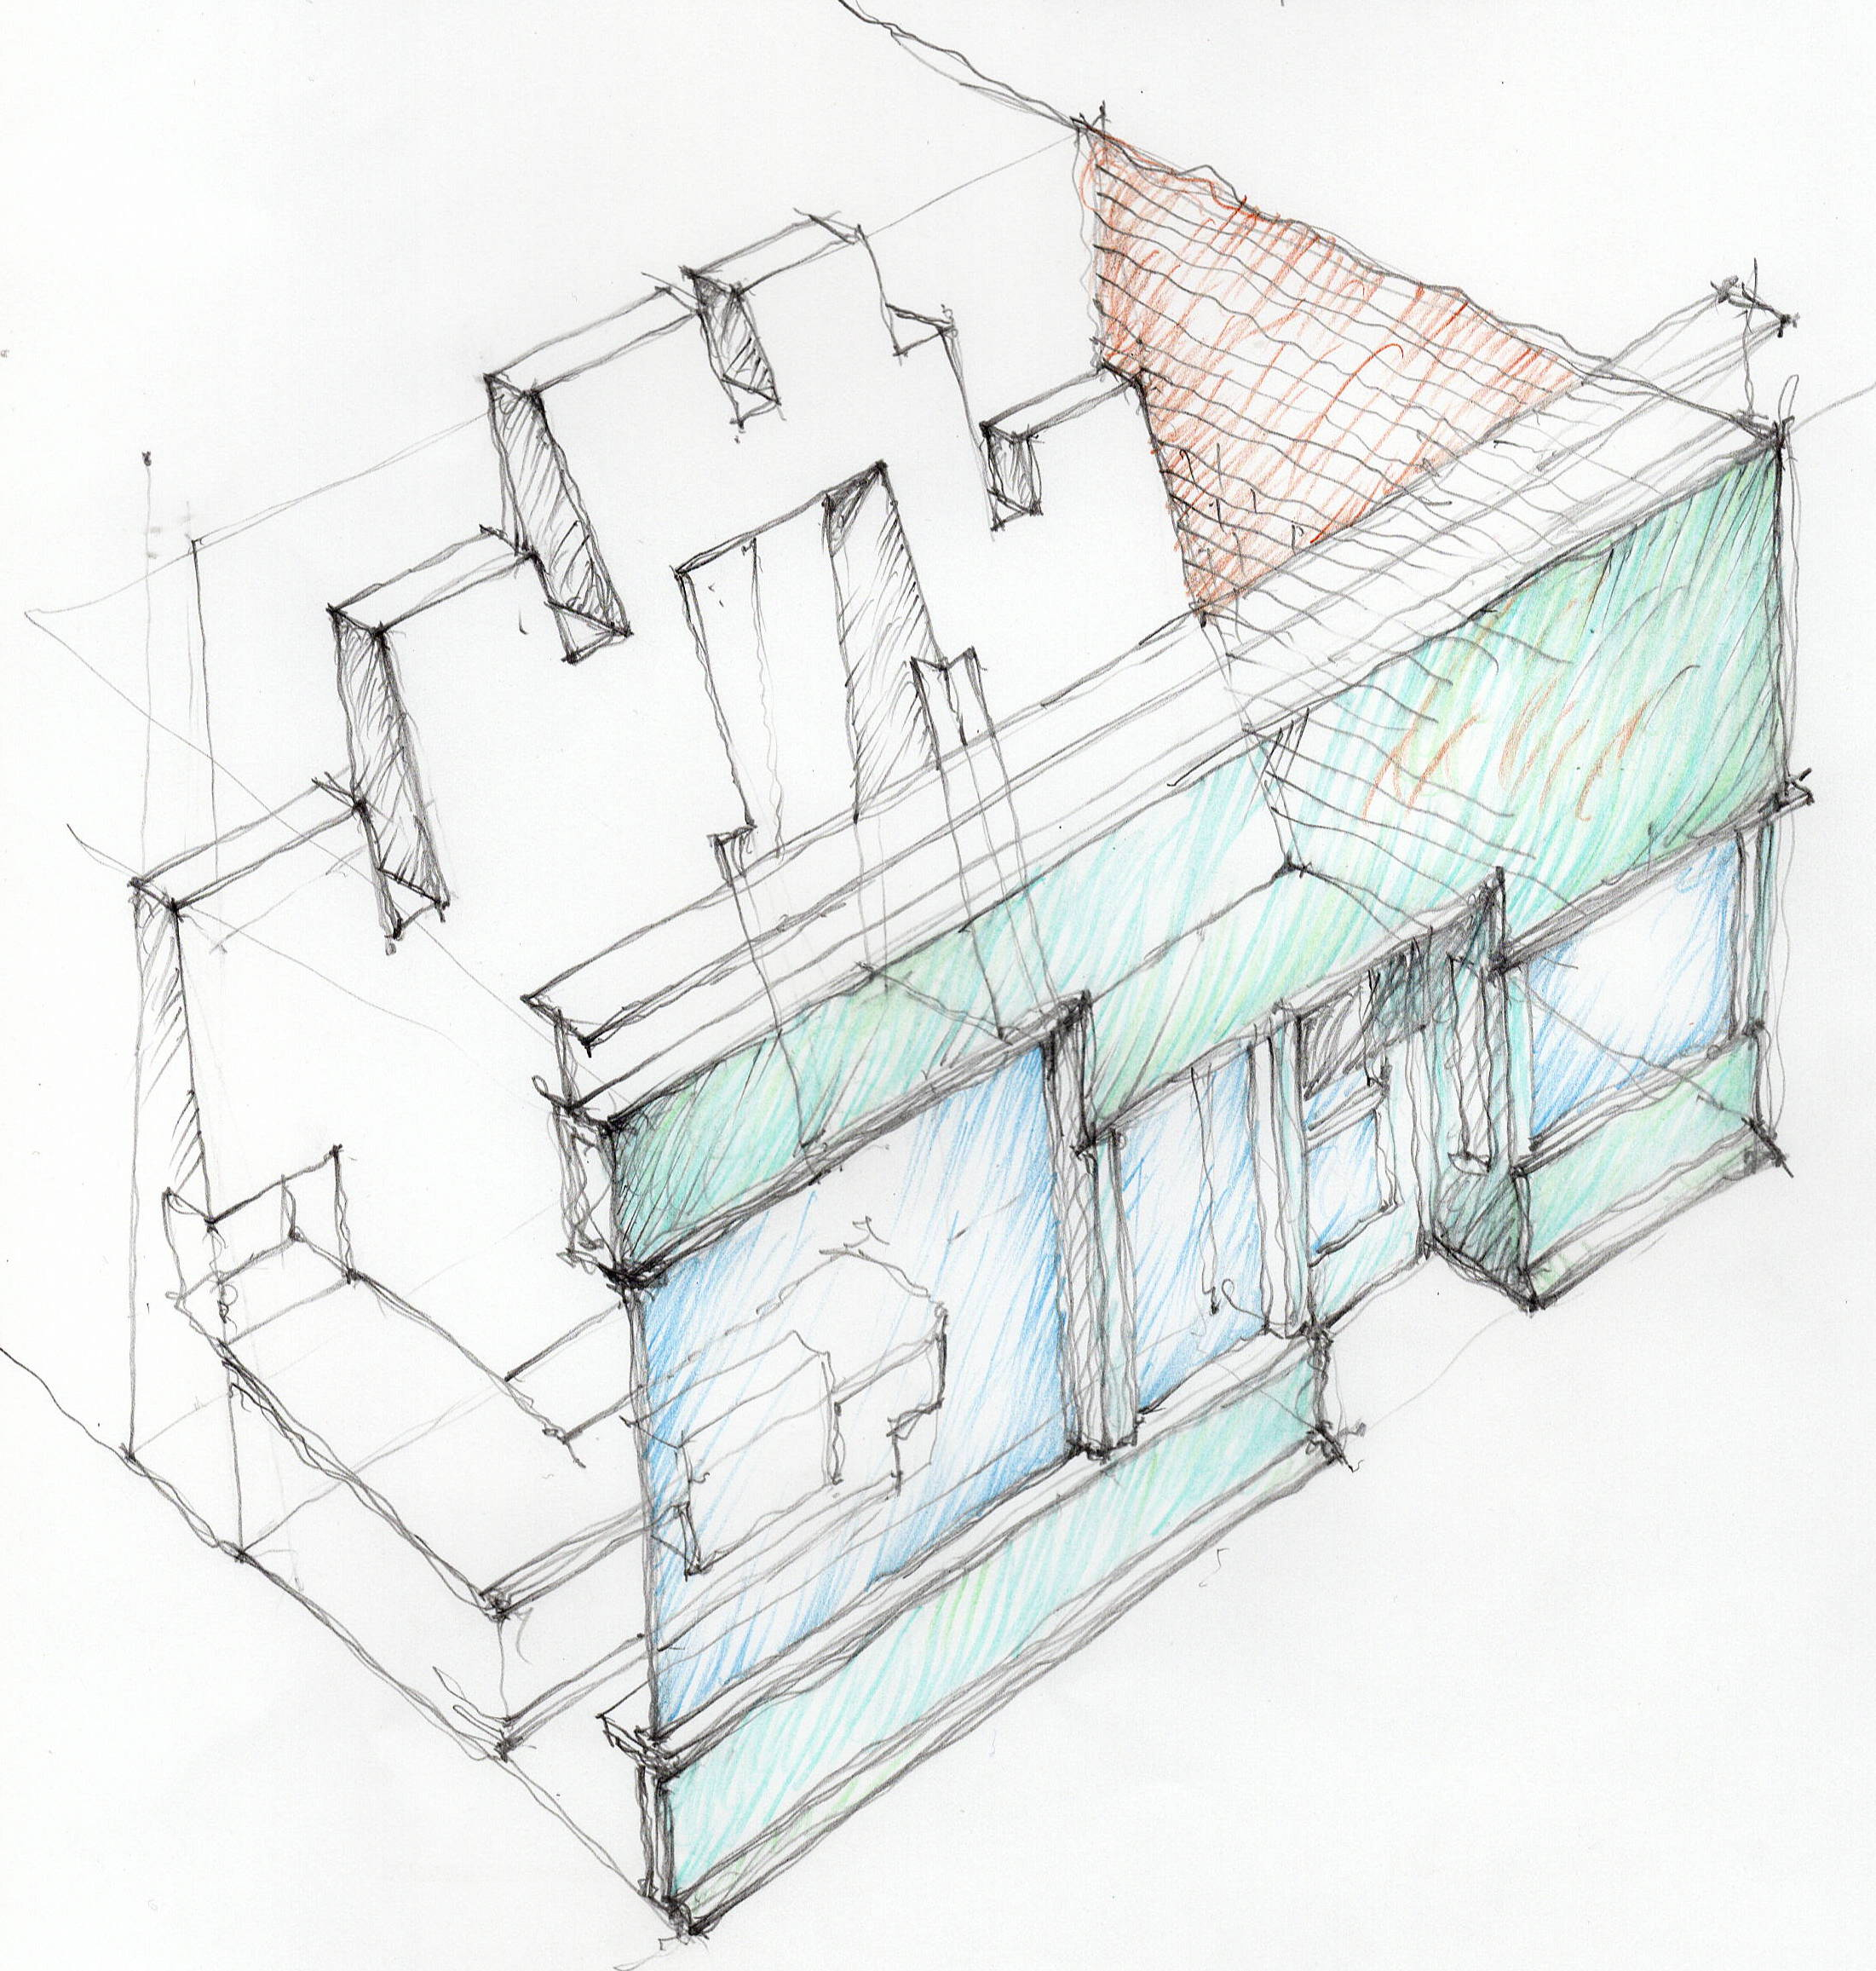 Huascar & Co. Bake Shop - George Ranalli Architect